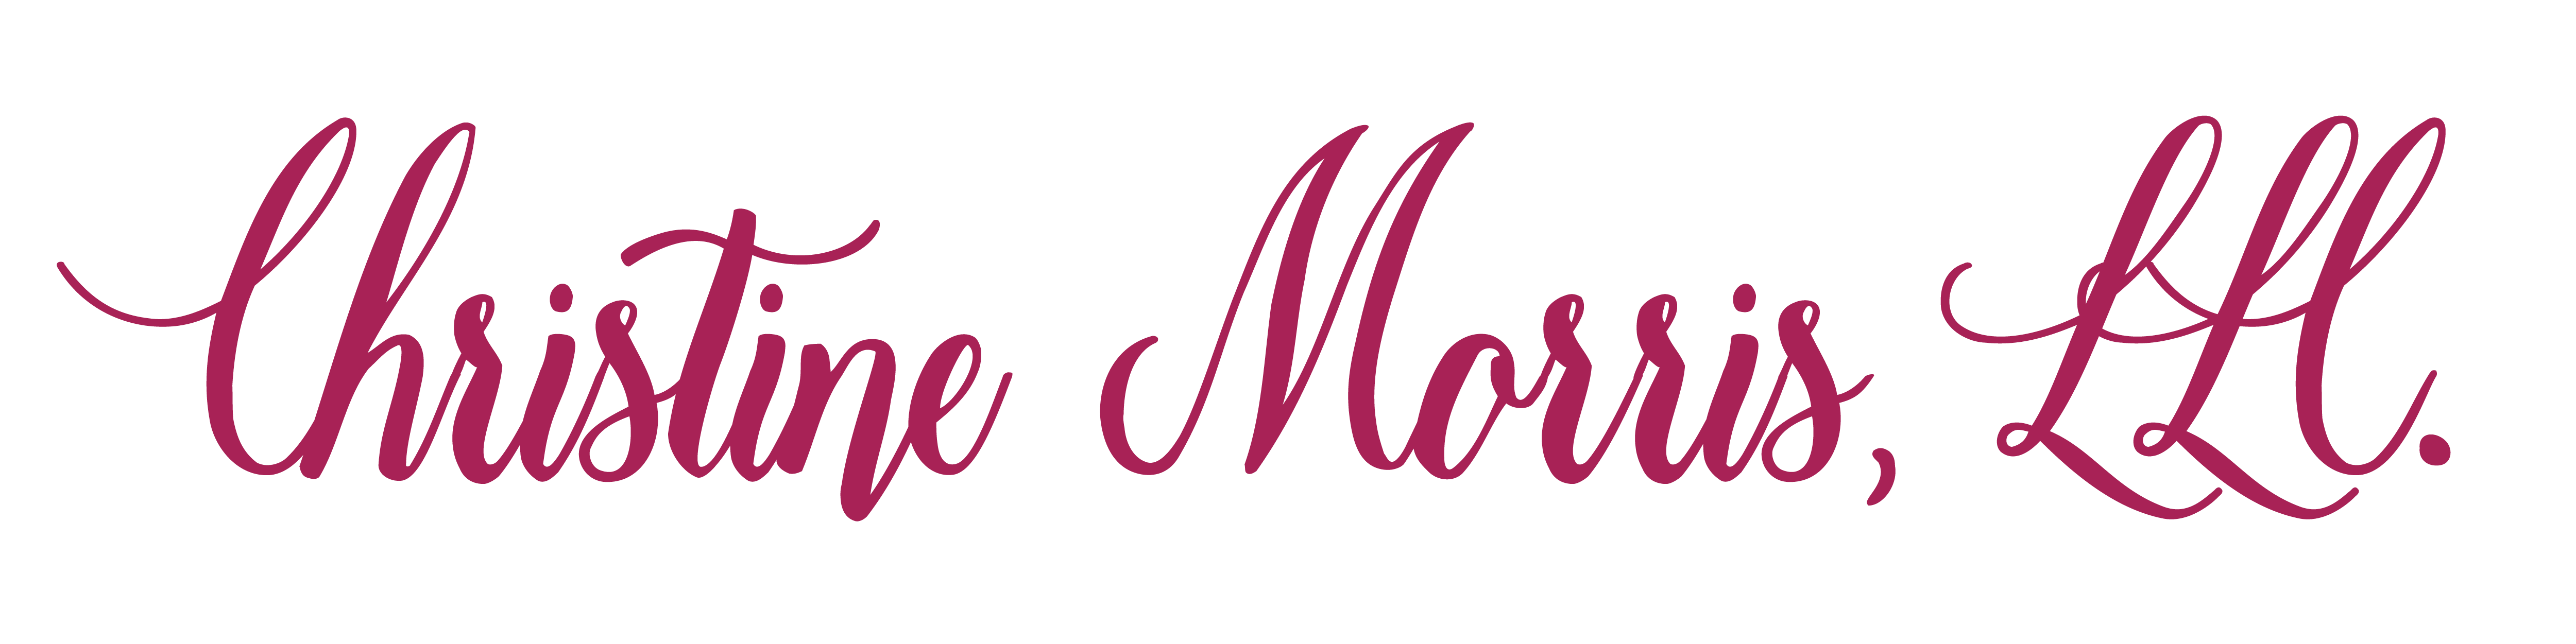 Christine Morris, LLC.